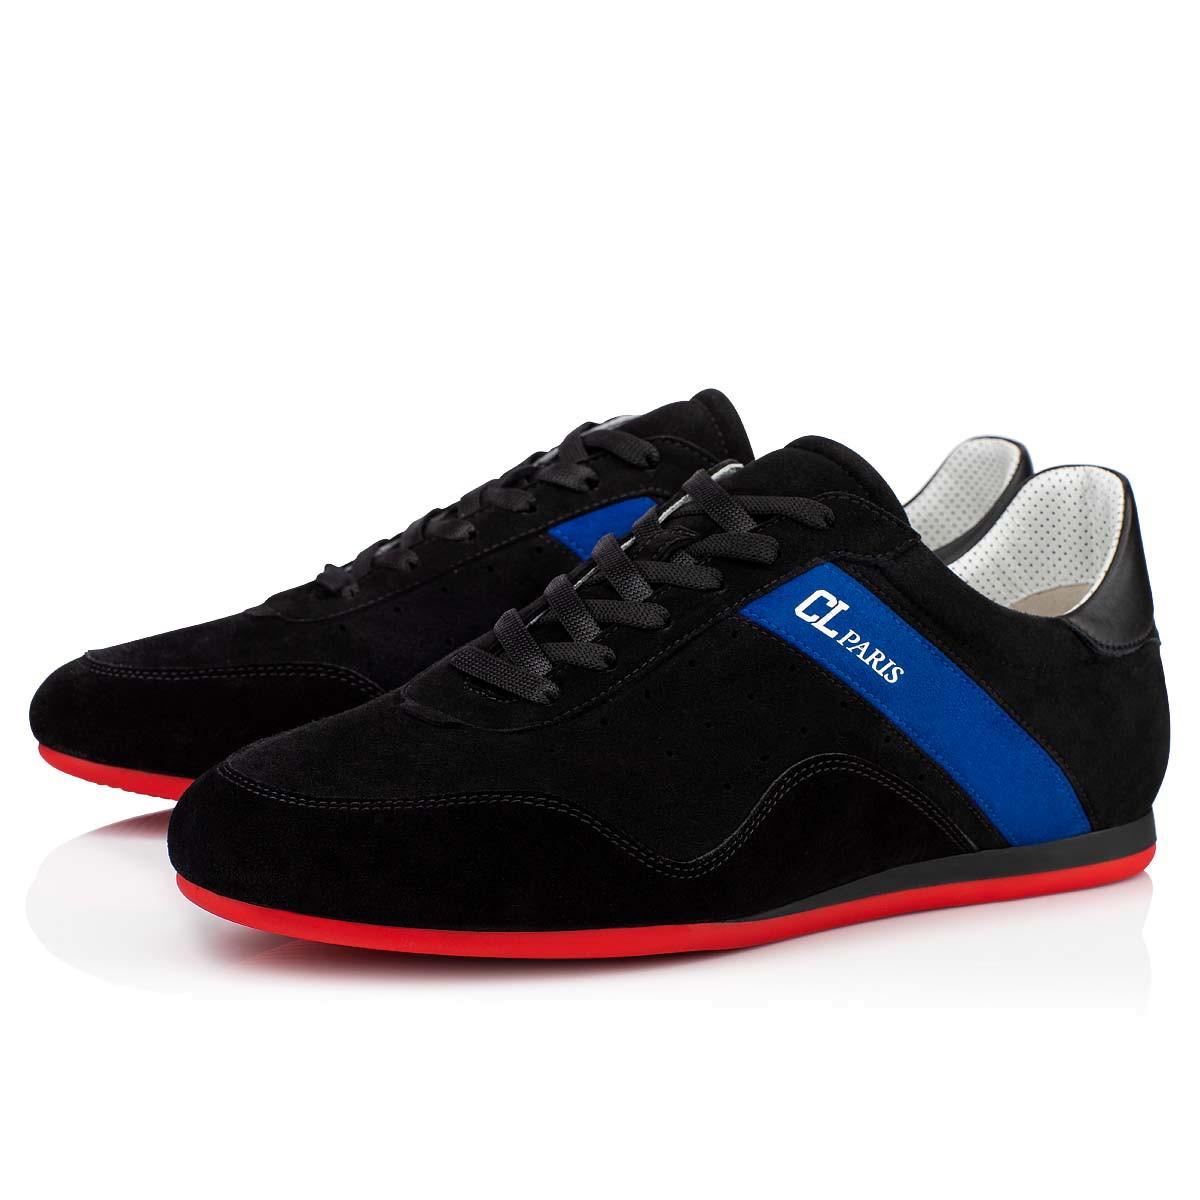 Shoes - My K Low Flat - Christian Louboutin